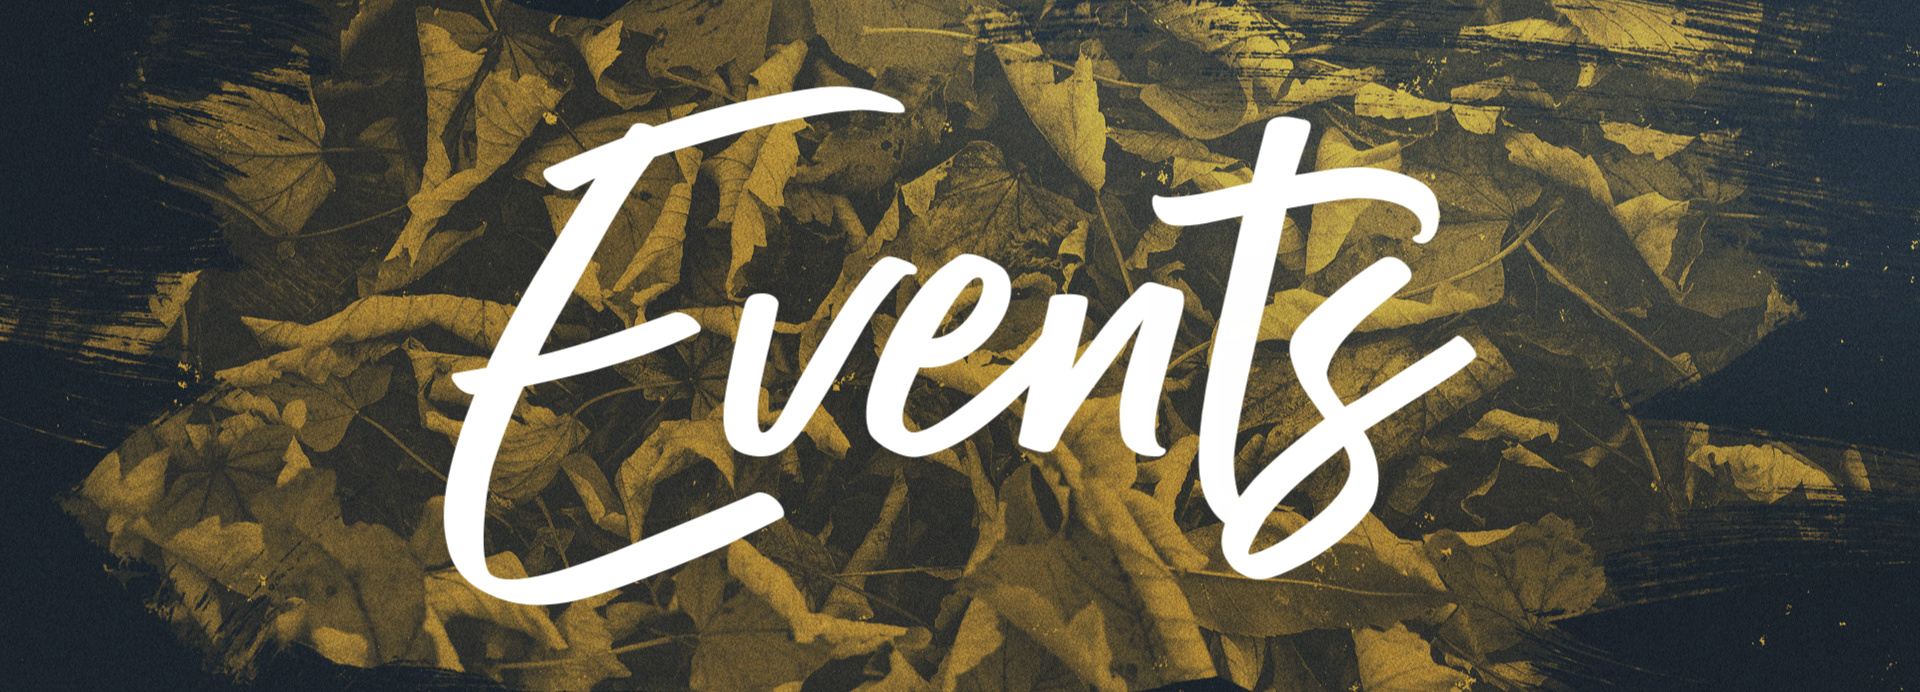 Events - App (1).jpg